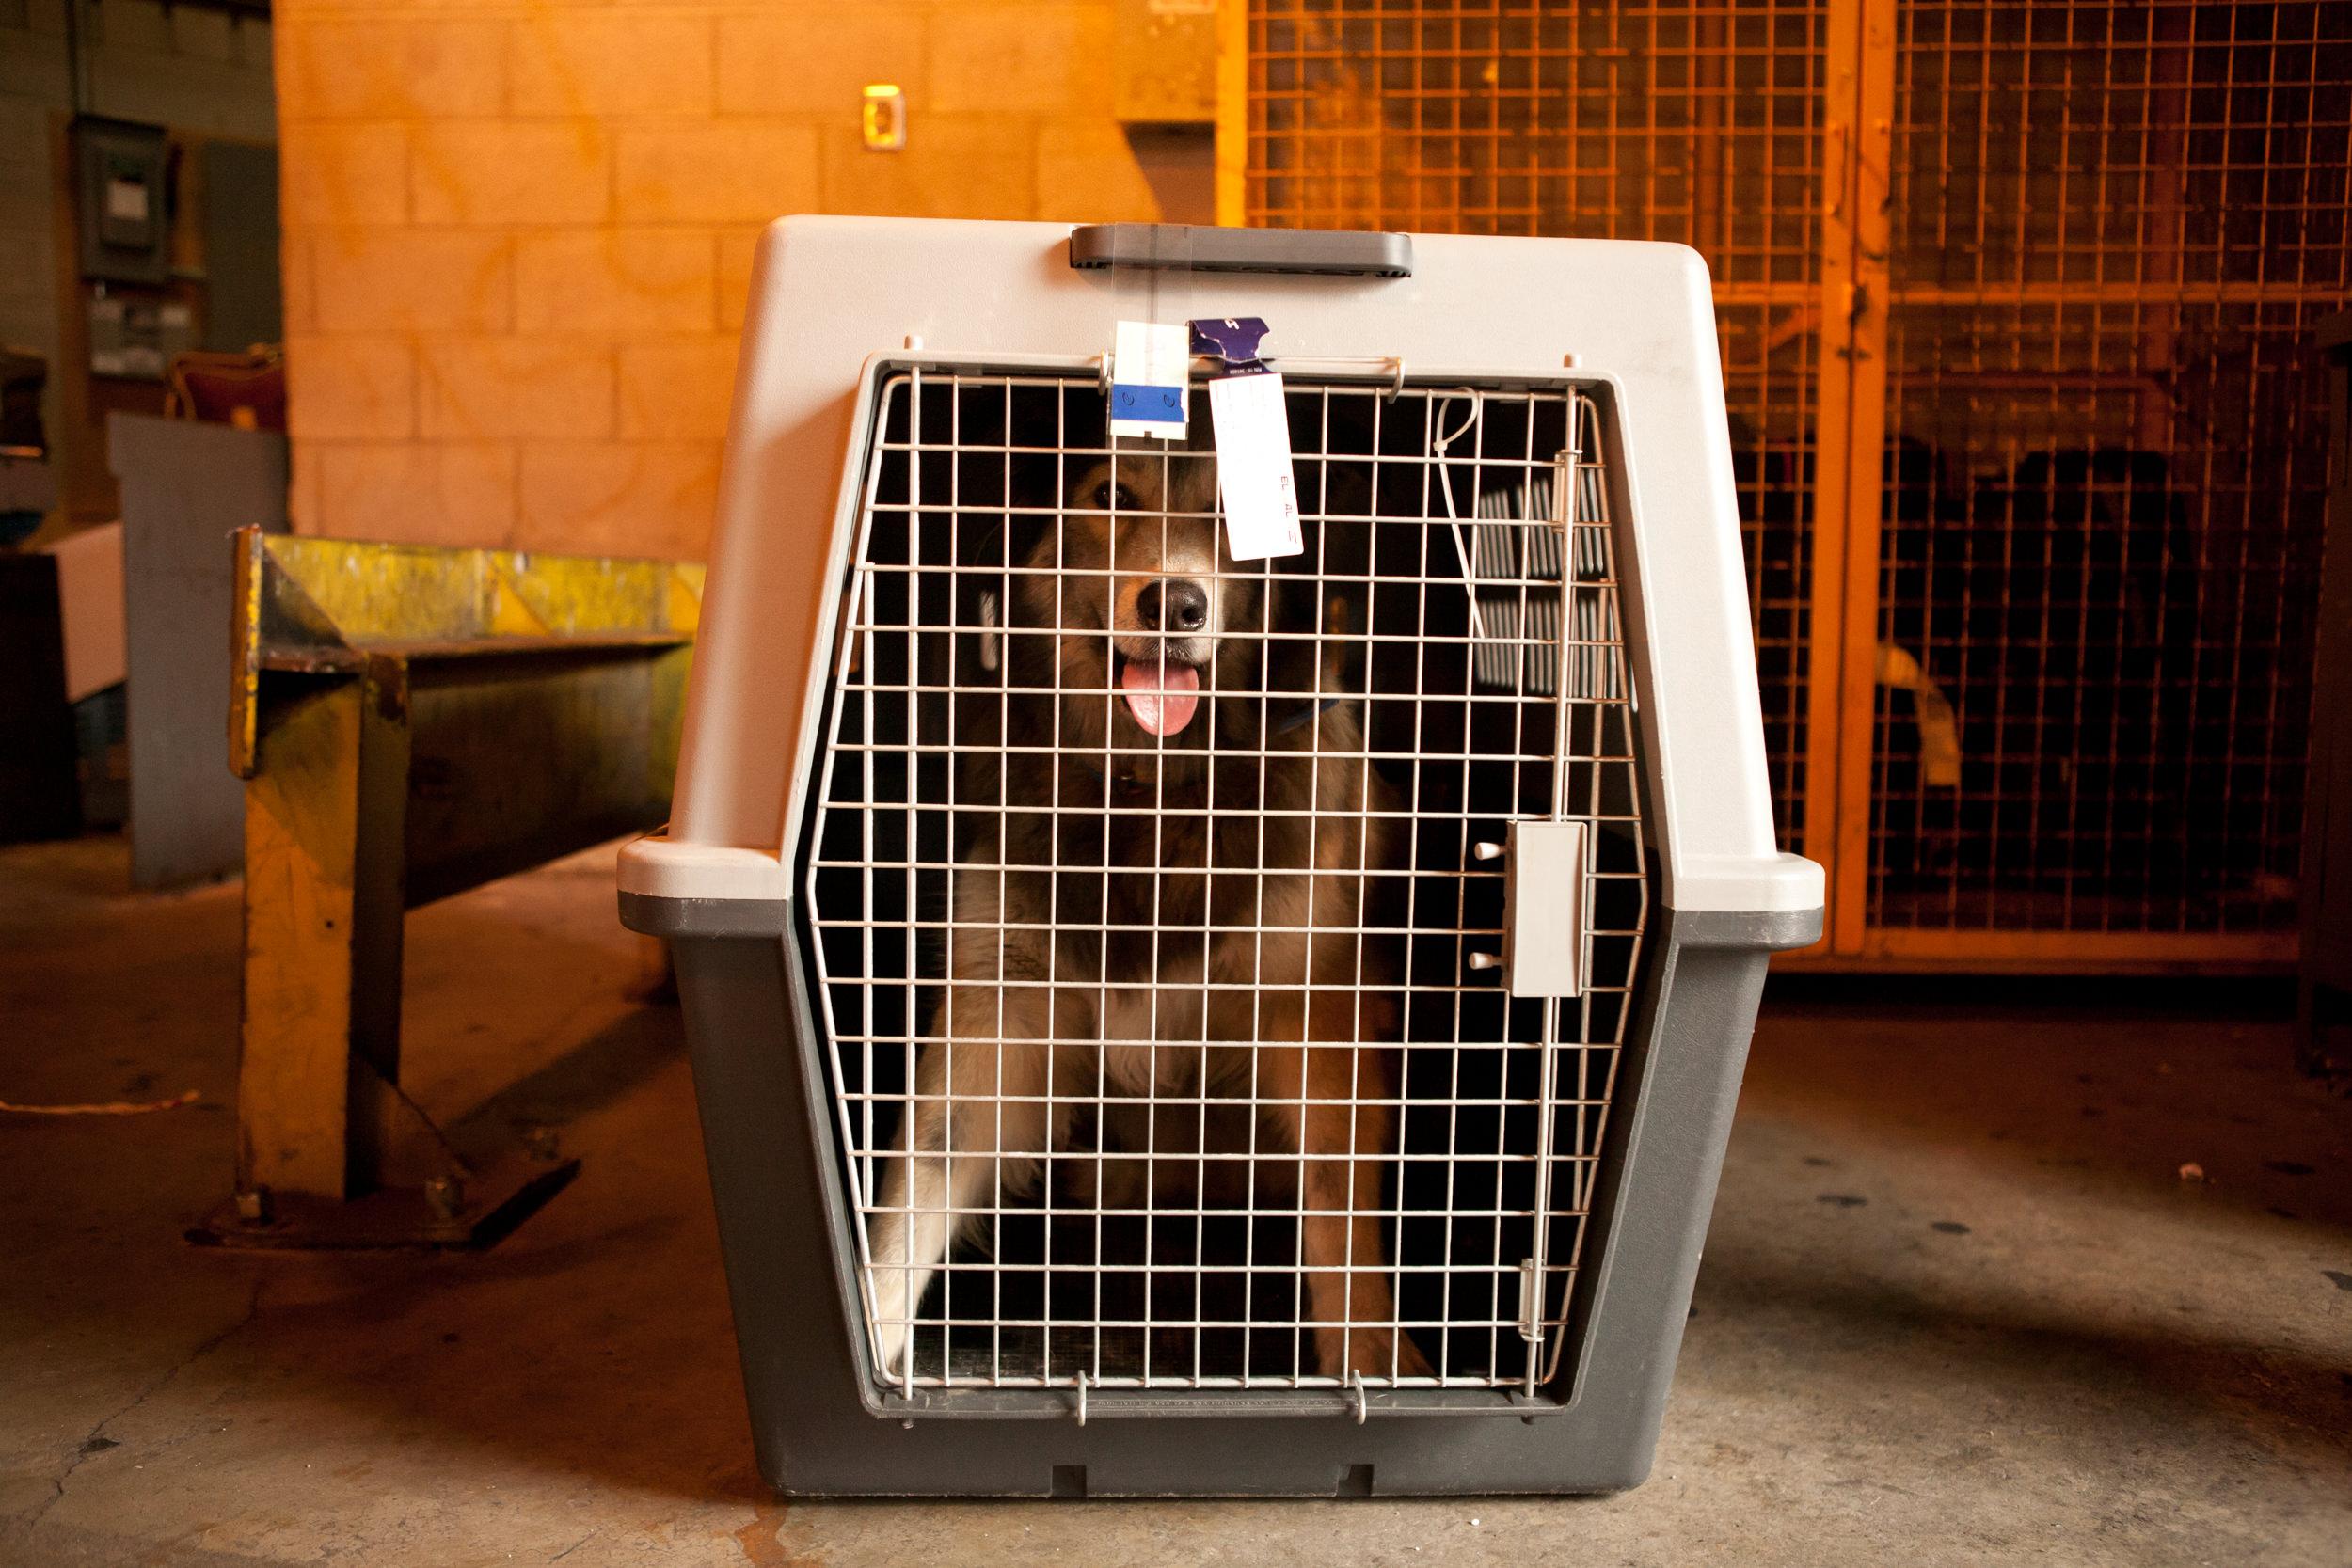 shlomi-amiga-dogs-in-cages-10.jpg